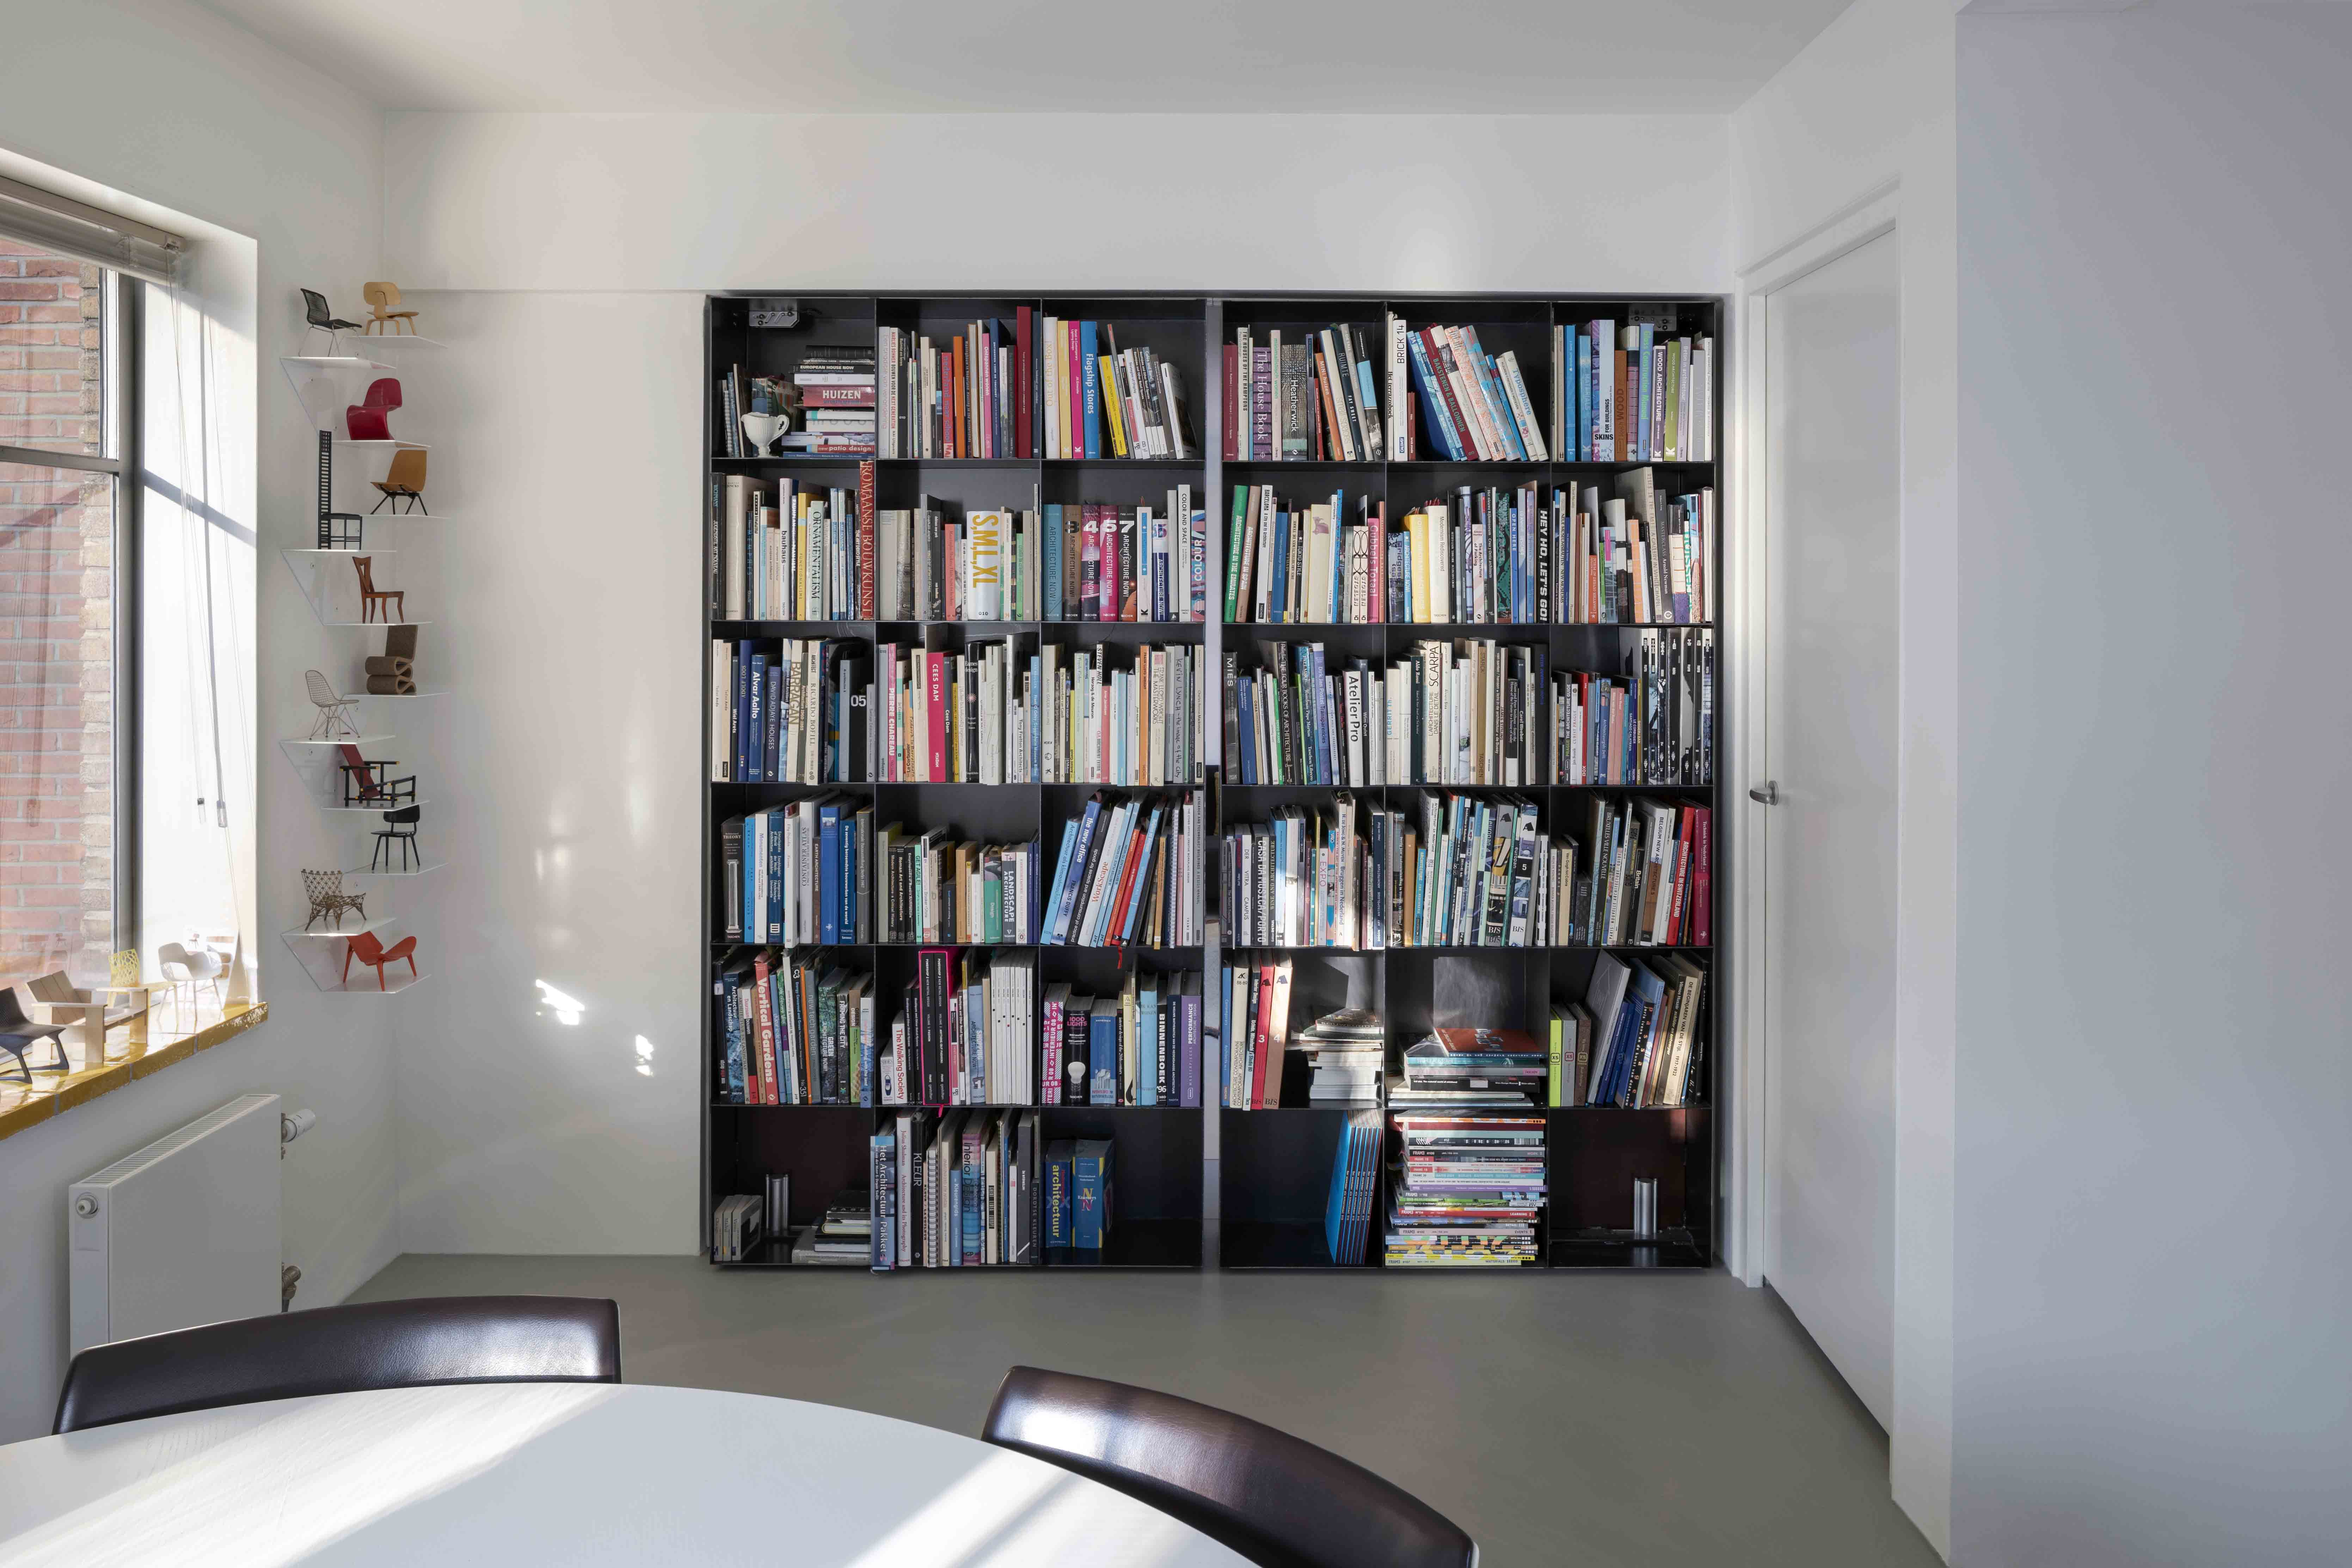 Pivoting bookcases by Ernst Hoek, Hoek & de Wit Architecten, with pivot hinge System M by FritsJurgens